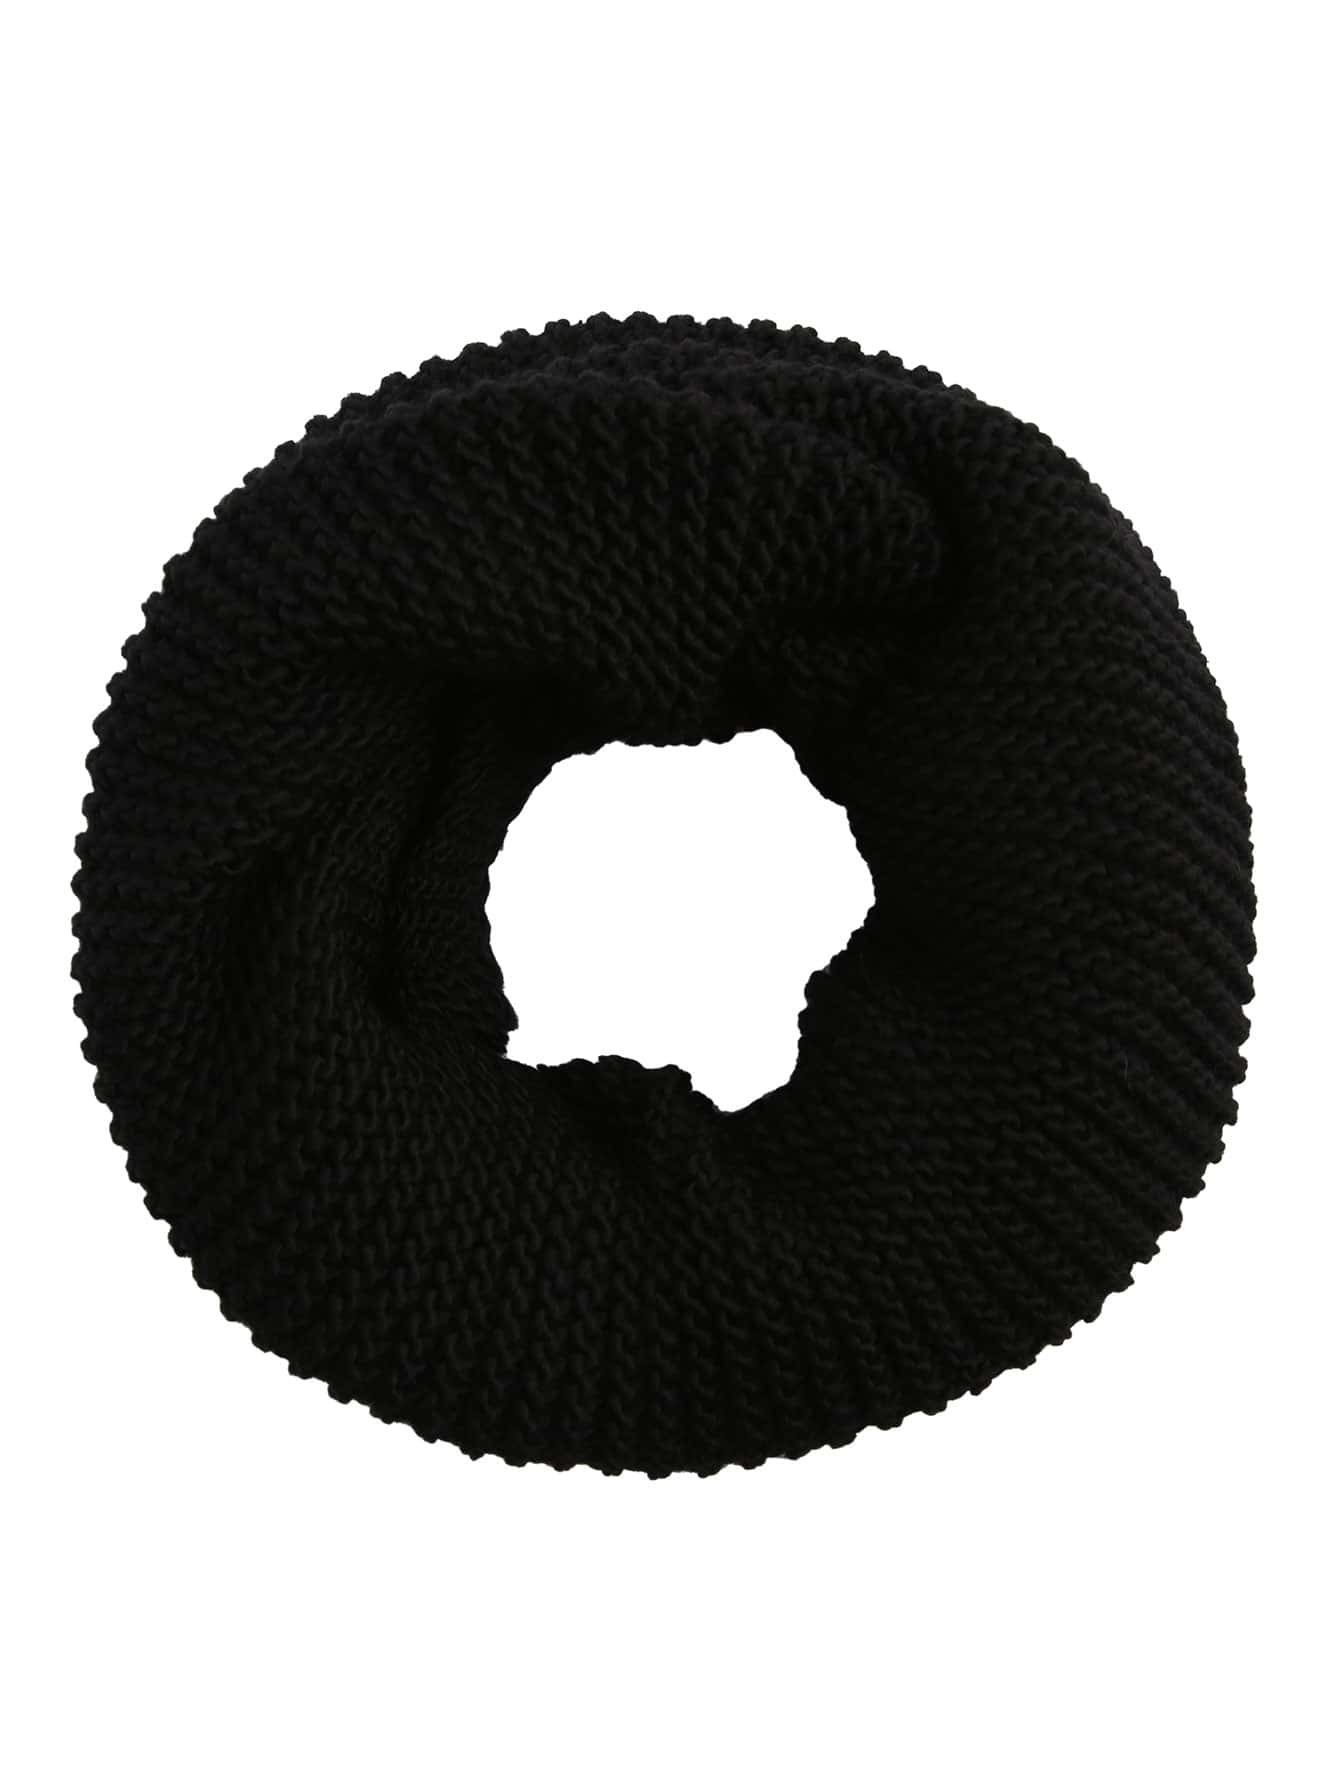 Black Ribbed Knit Infinity Scarf scarf160910302